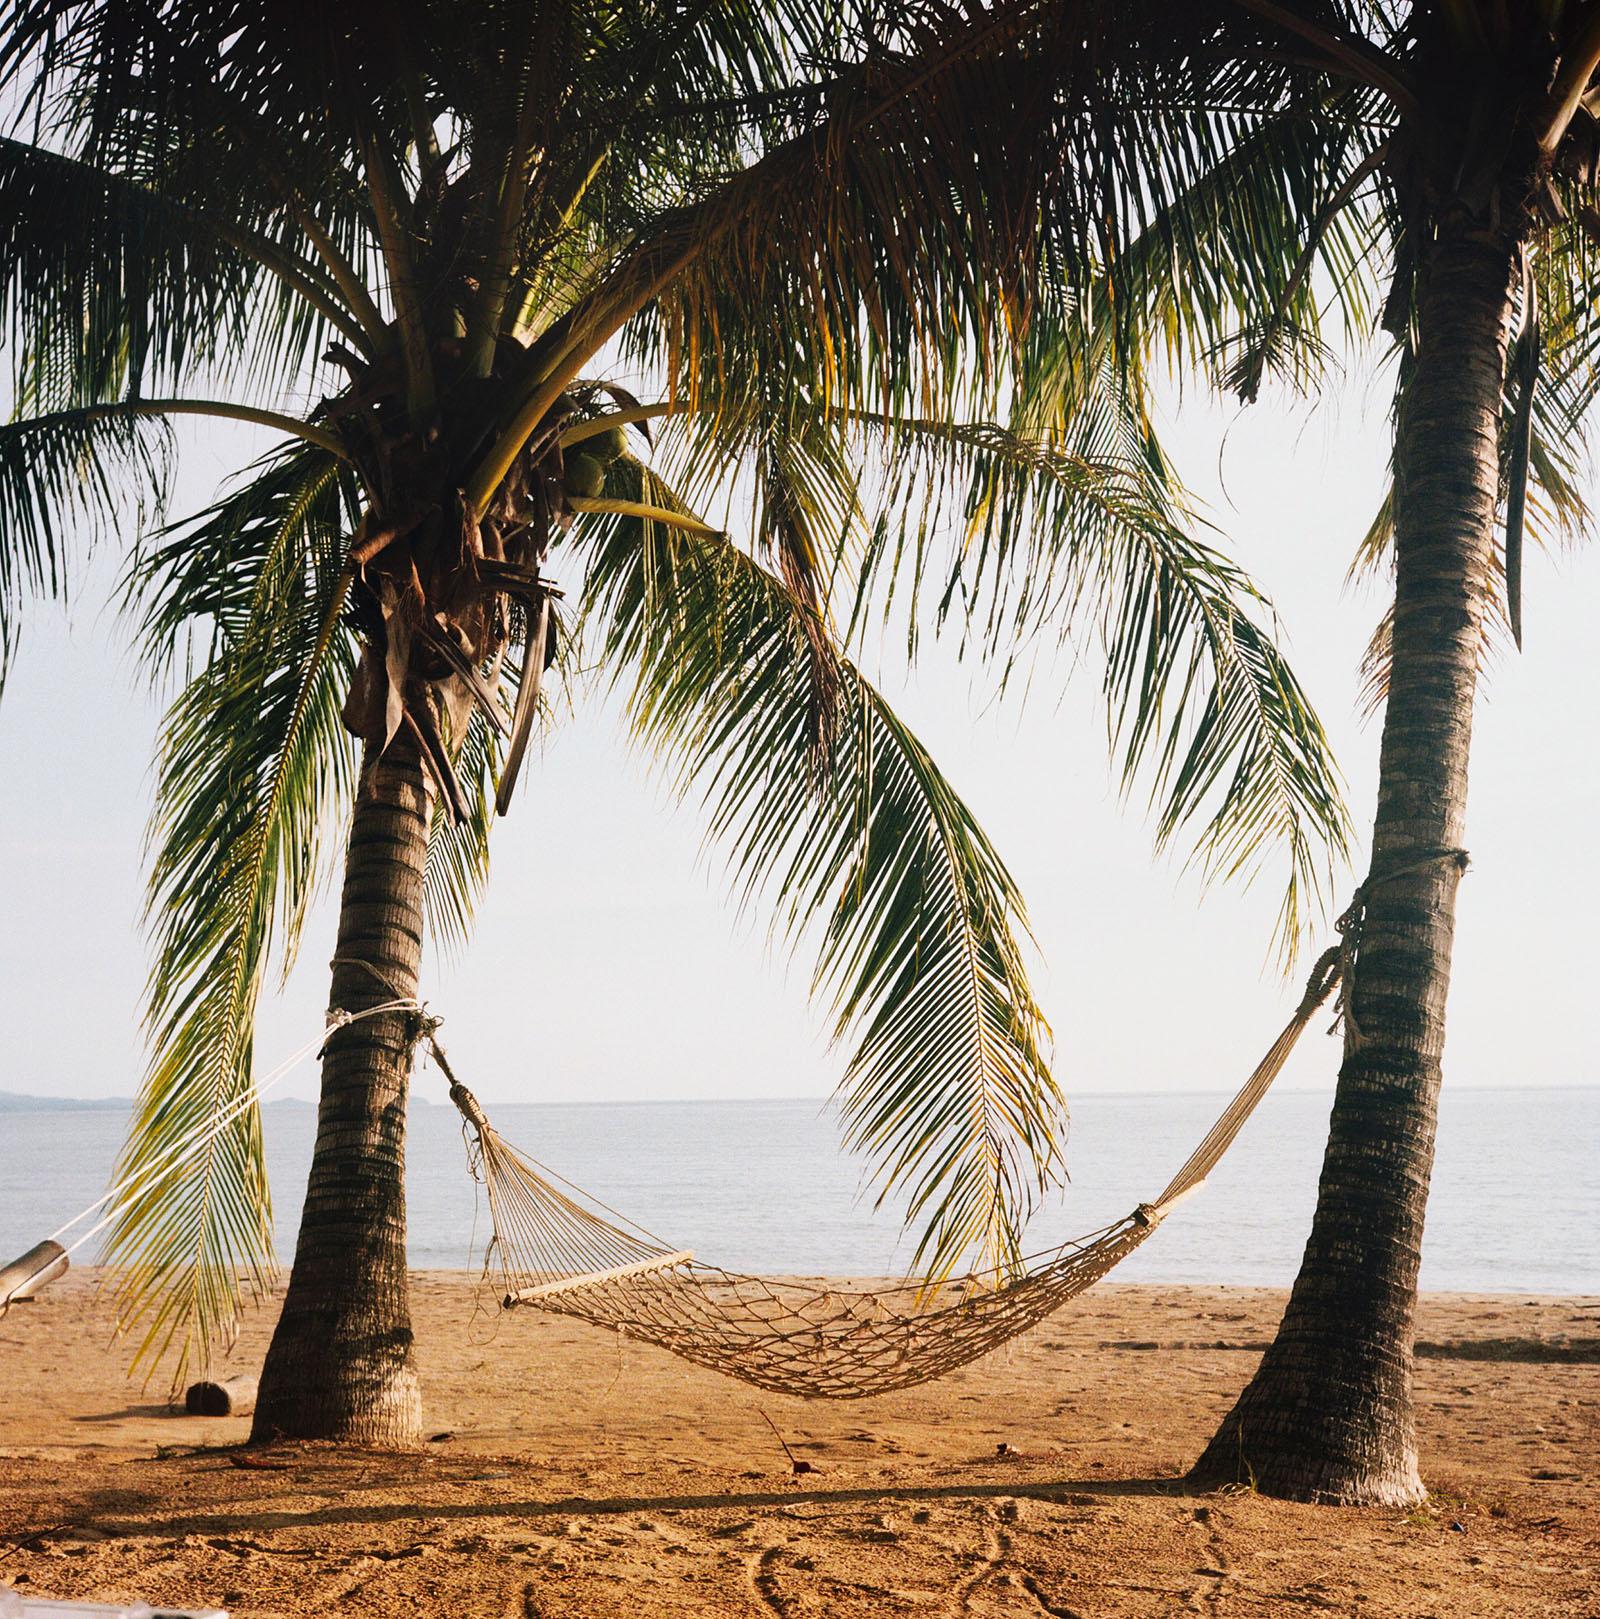 Hammock between palm trees at Baan Koh Mak | Thailand Travel Photos